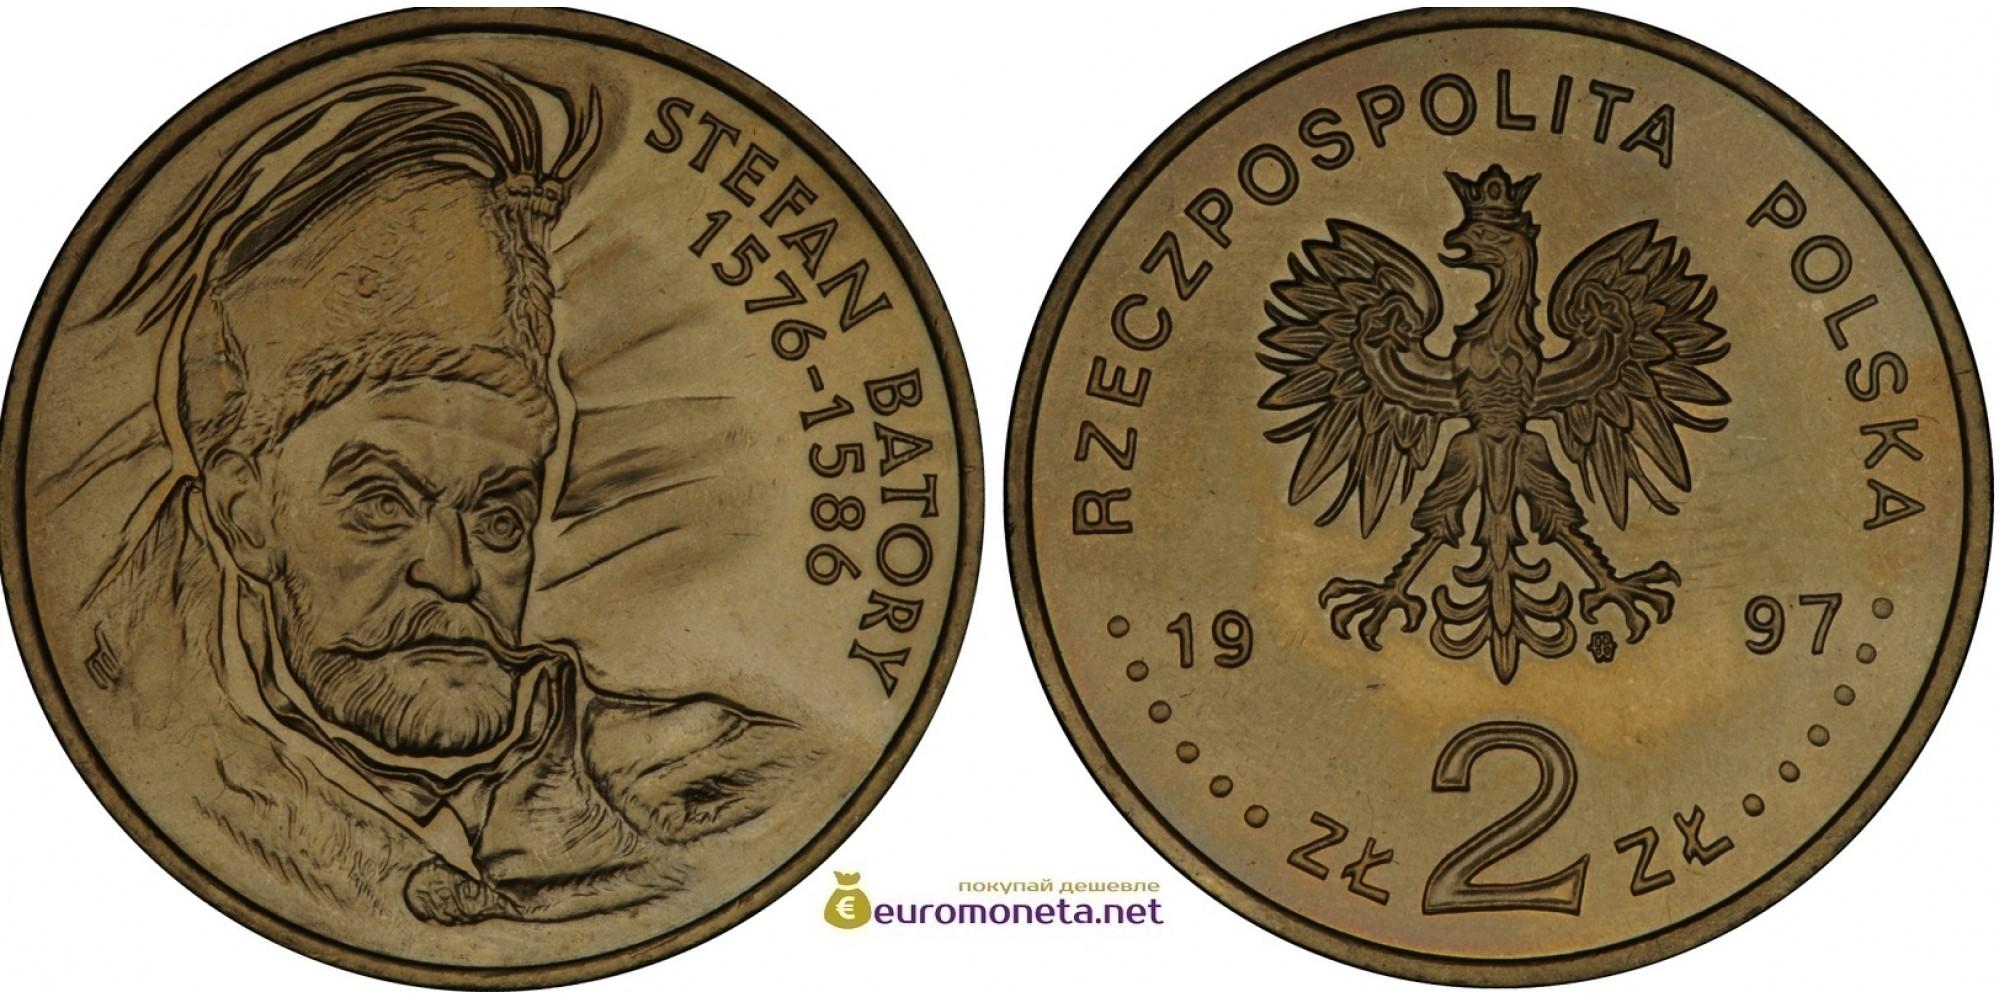 Польша 2 злотых 1997 год Стефан Баторий (Stefan Batory)